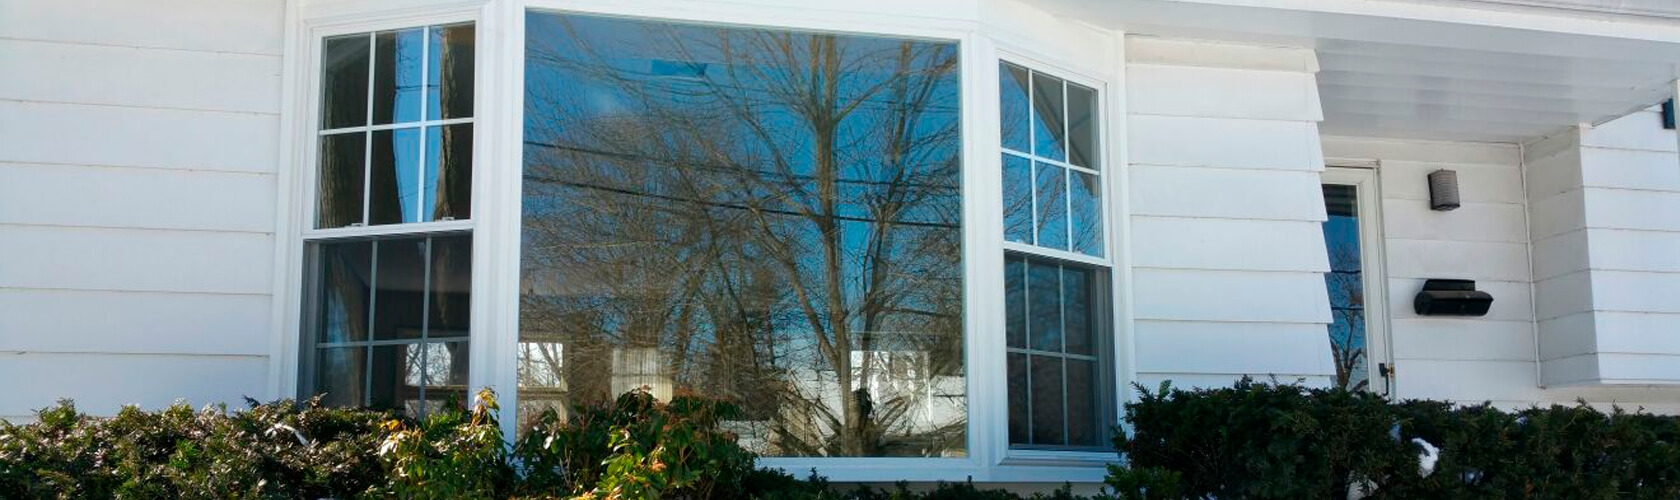 Home Windows Sale and Installation (@homewindowssaleinstallation) Cover Image